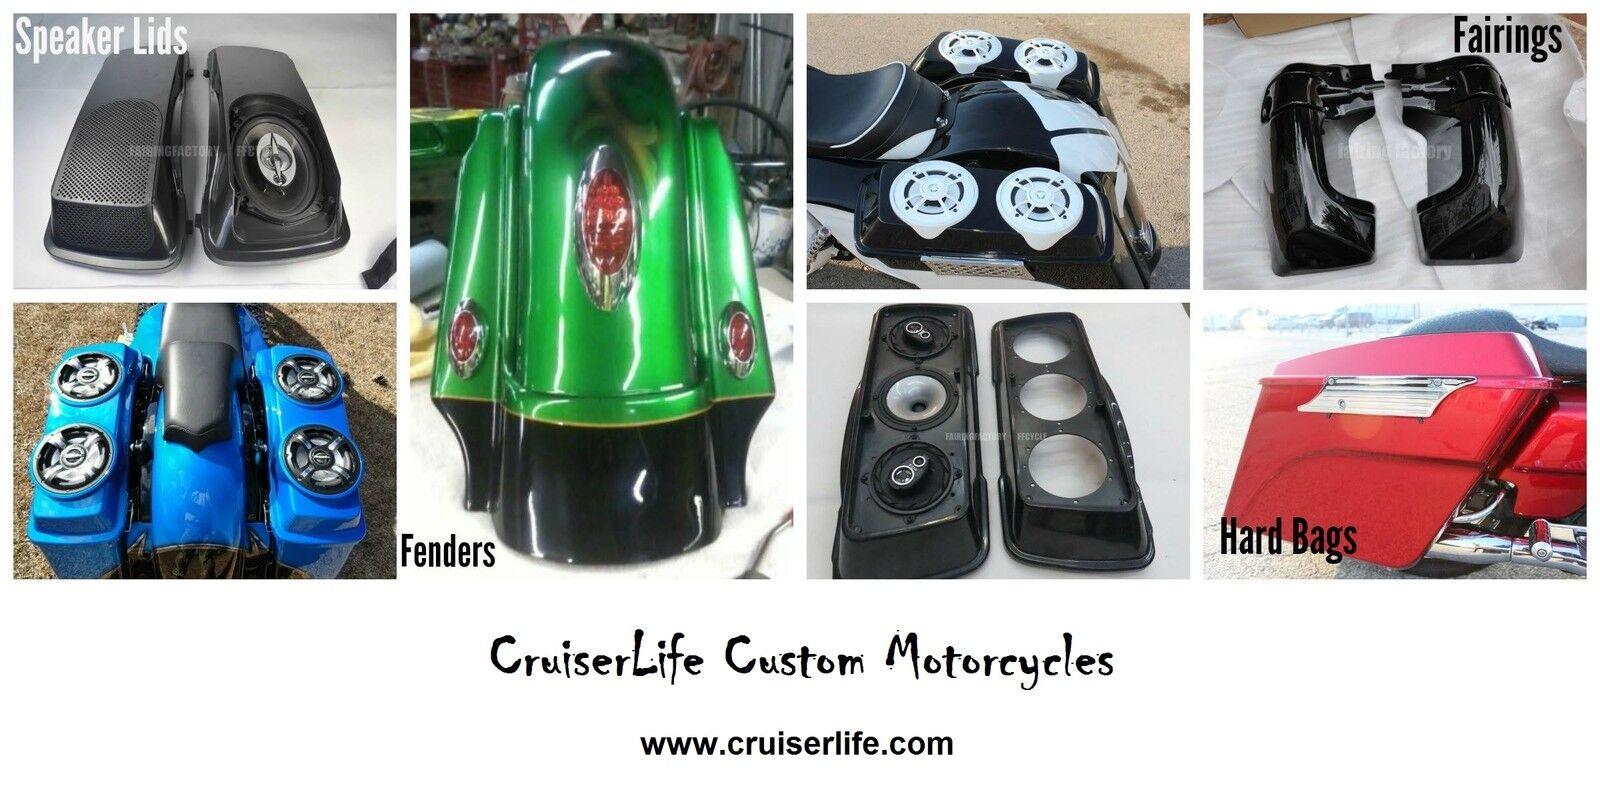 Cruiser Life Motorcycle Parts